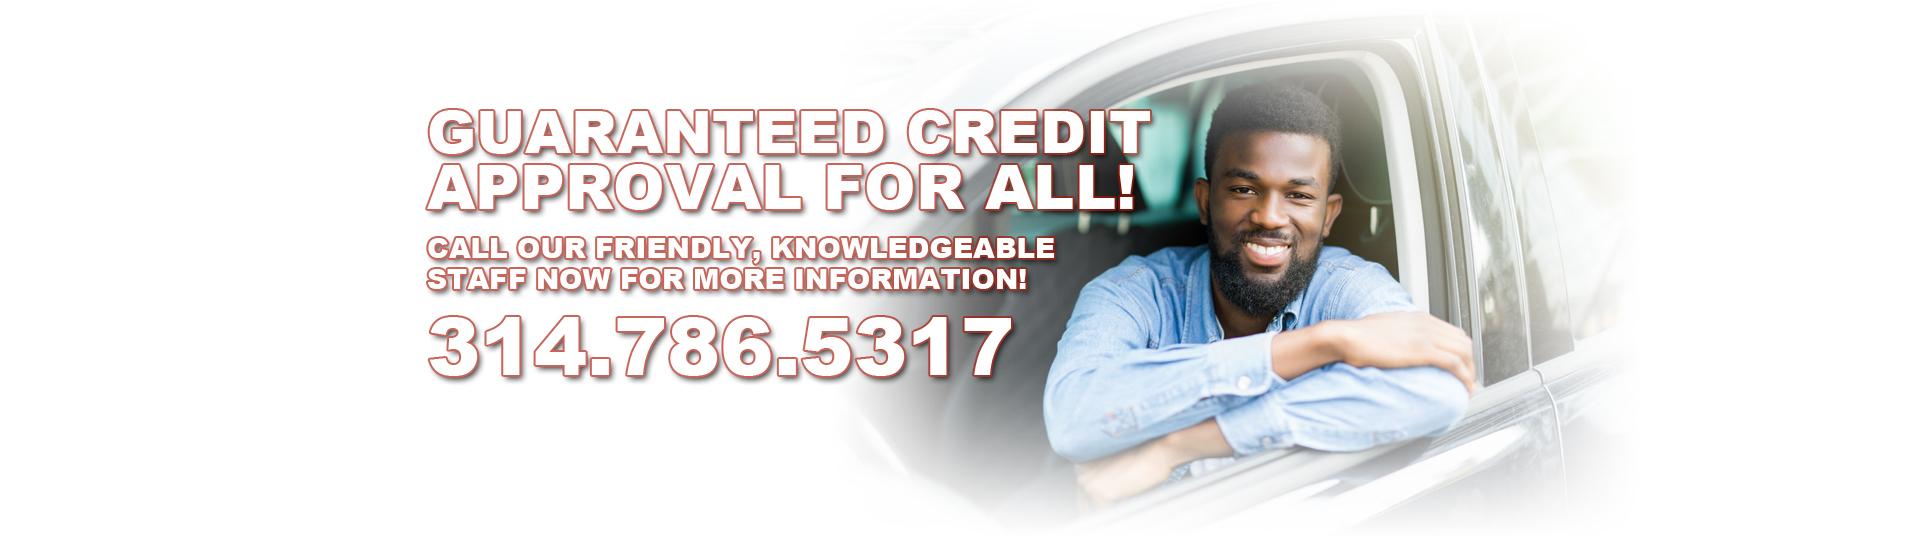 https://x-assets.autorevo-powersites.com/content/assets/clients/2215de71-f467-425e-b70e-351248ec9e4f/2-man-in-car